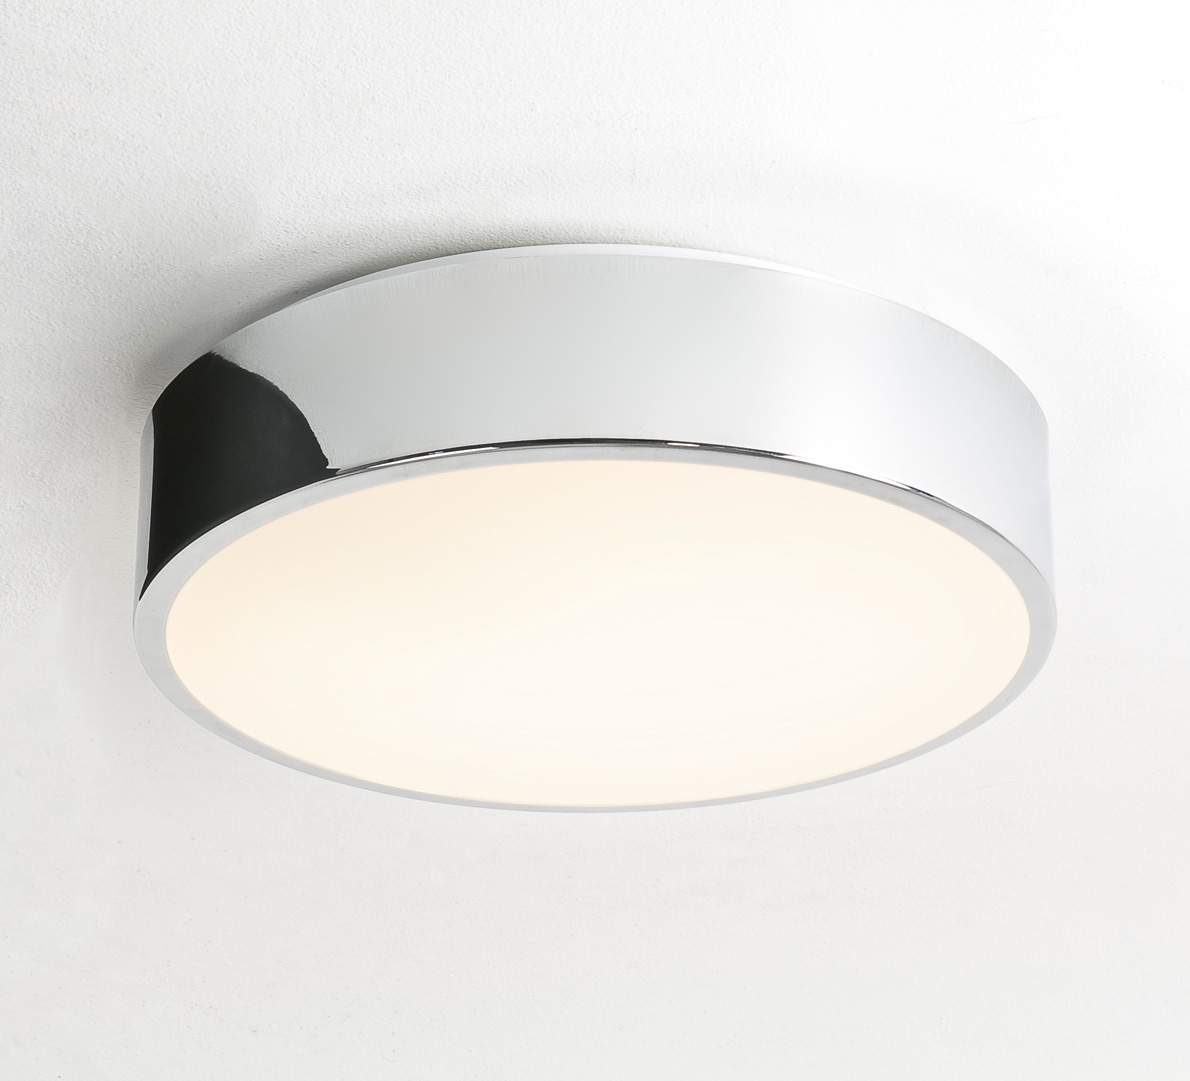 ASTRO Mallon Plus 0591 Round Bathroom Ceiling Light 1 X